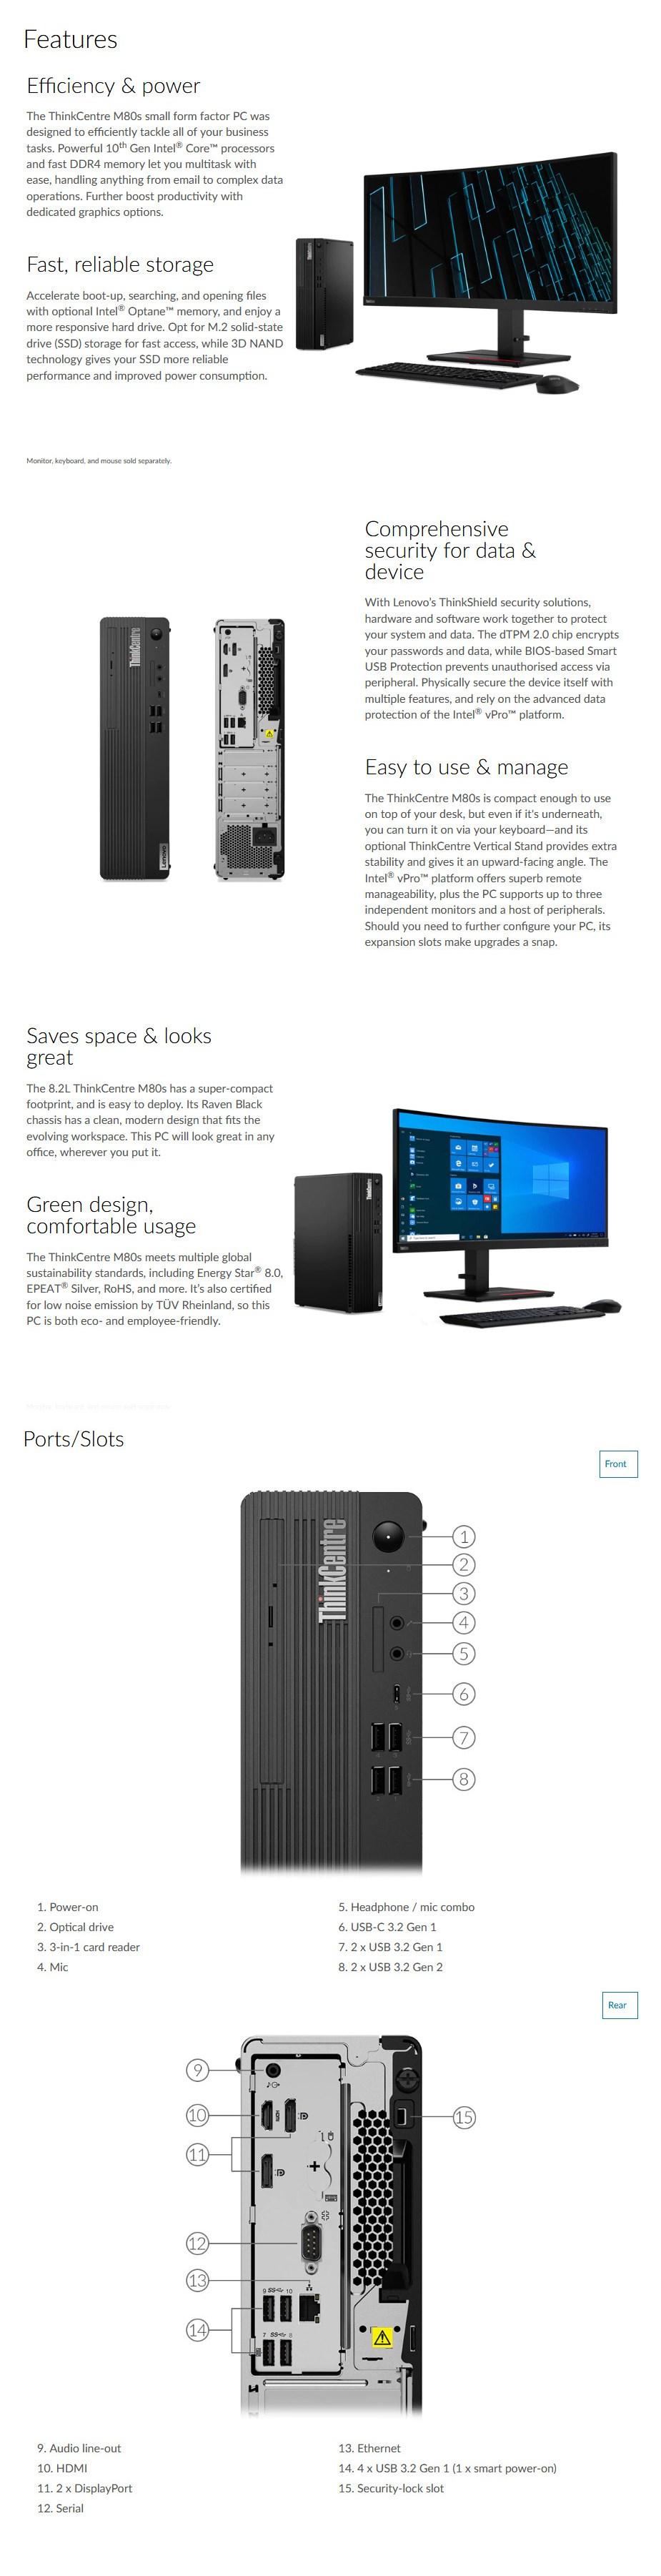 lenovo-m80s-sff-desktop-i510500-8gb-256gb-windows-10-pro-ac41119-5.jpg